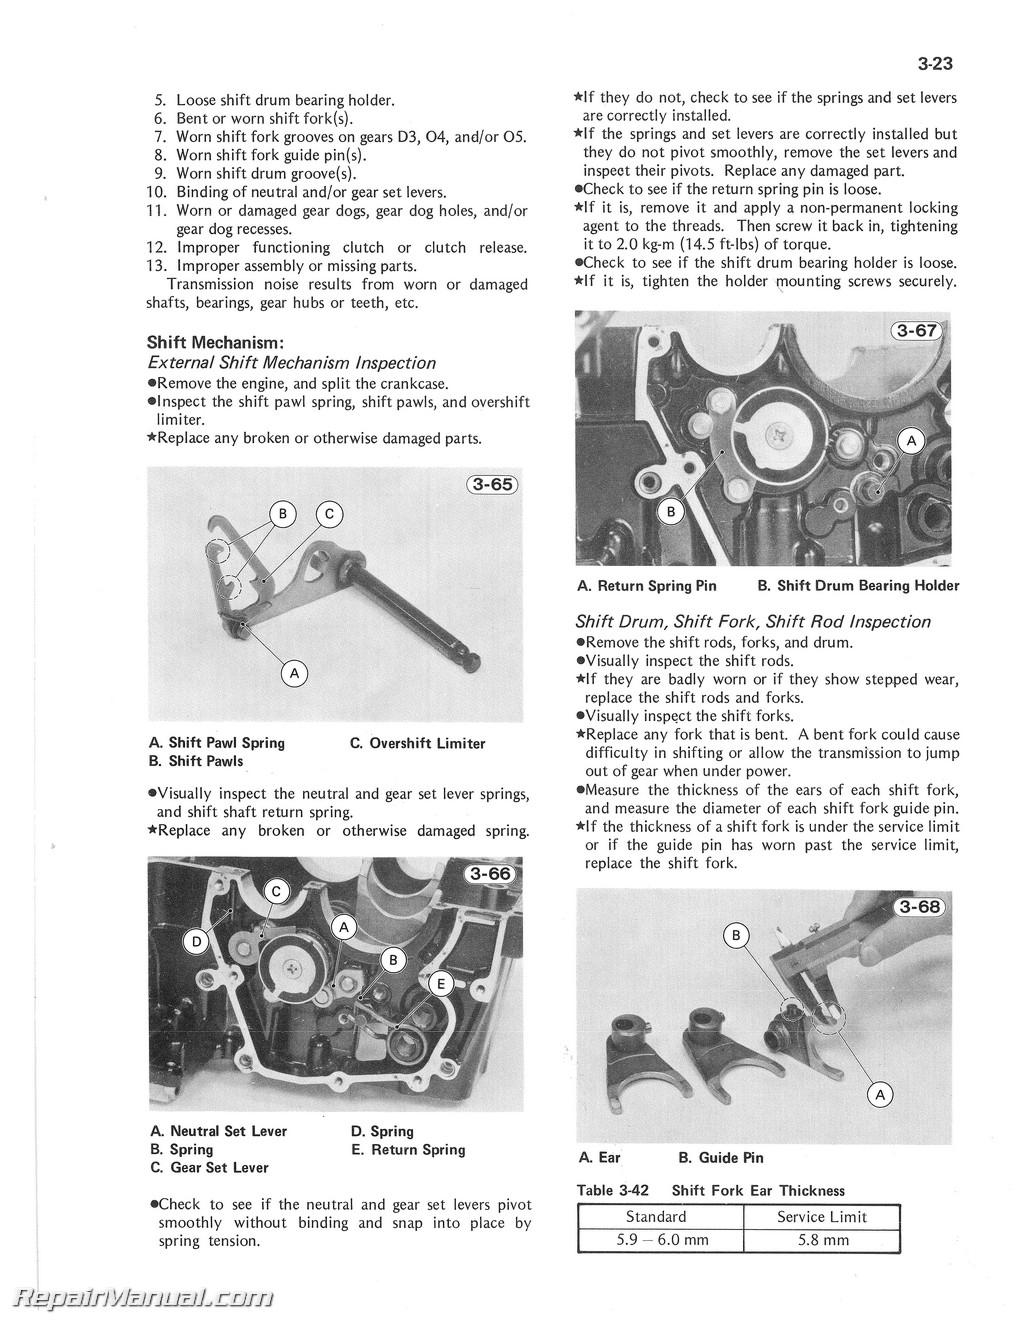 1978 kz1000 wiring diagram 2008 ford escape kawasaki ltd best library